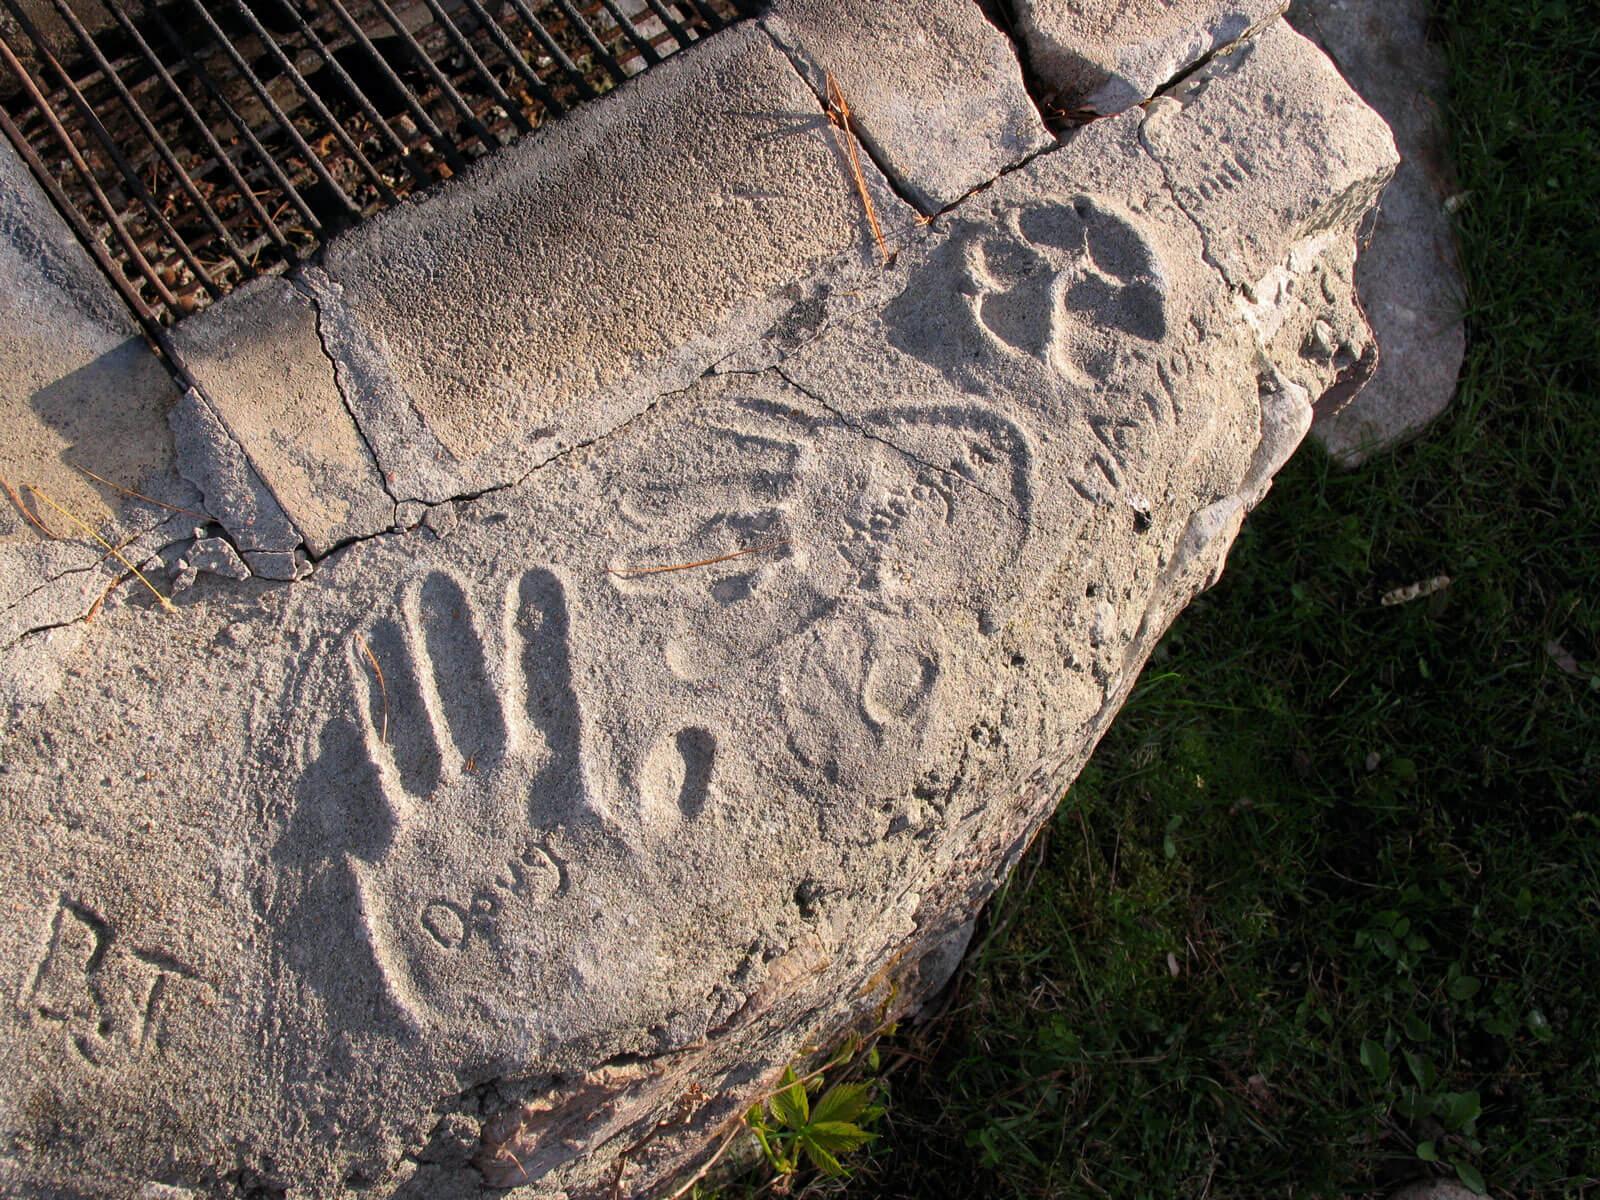 Handprints in concrete